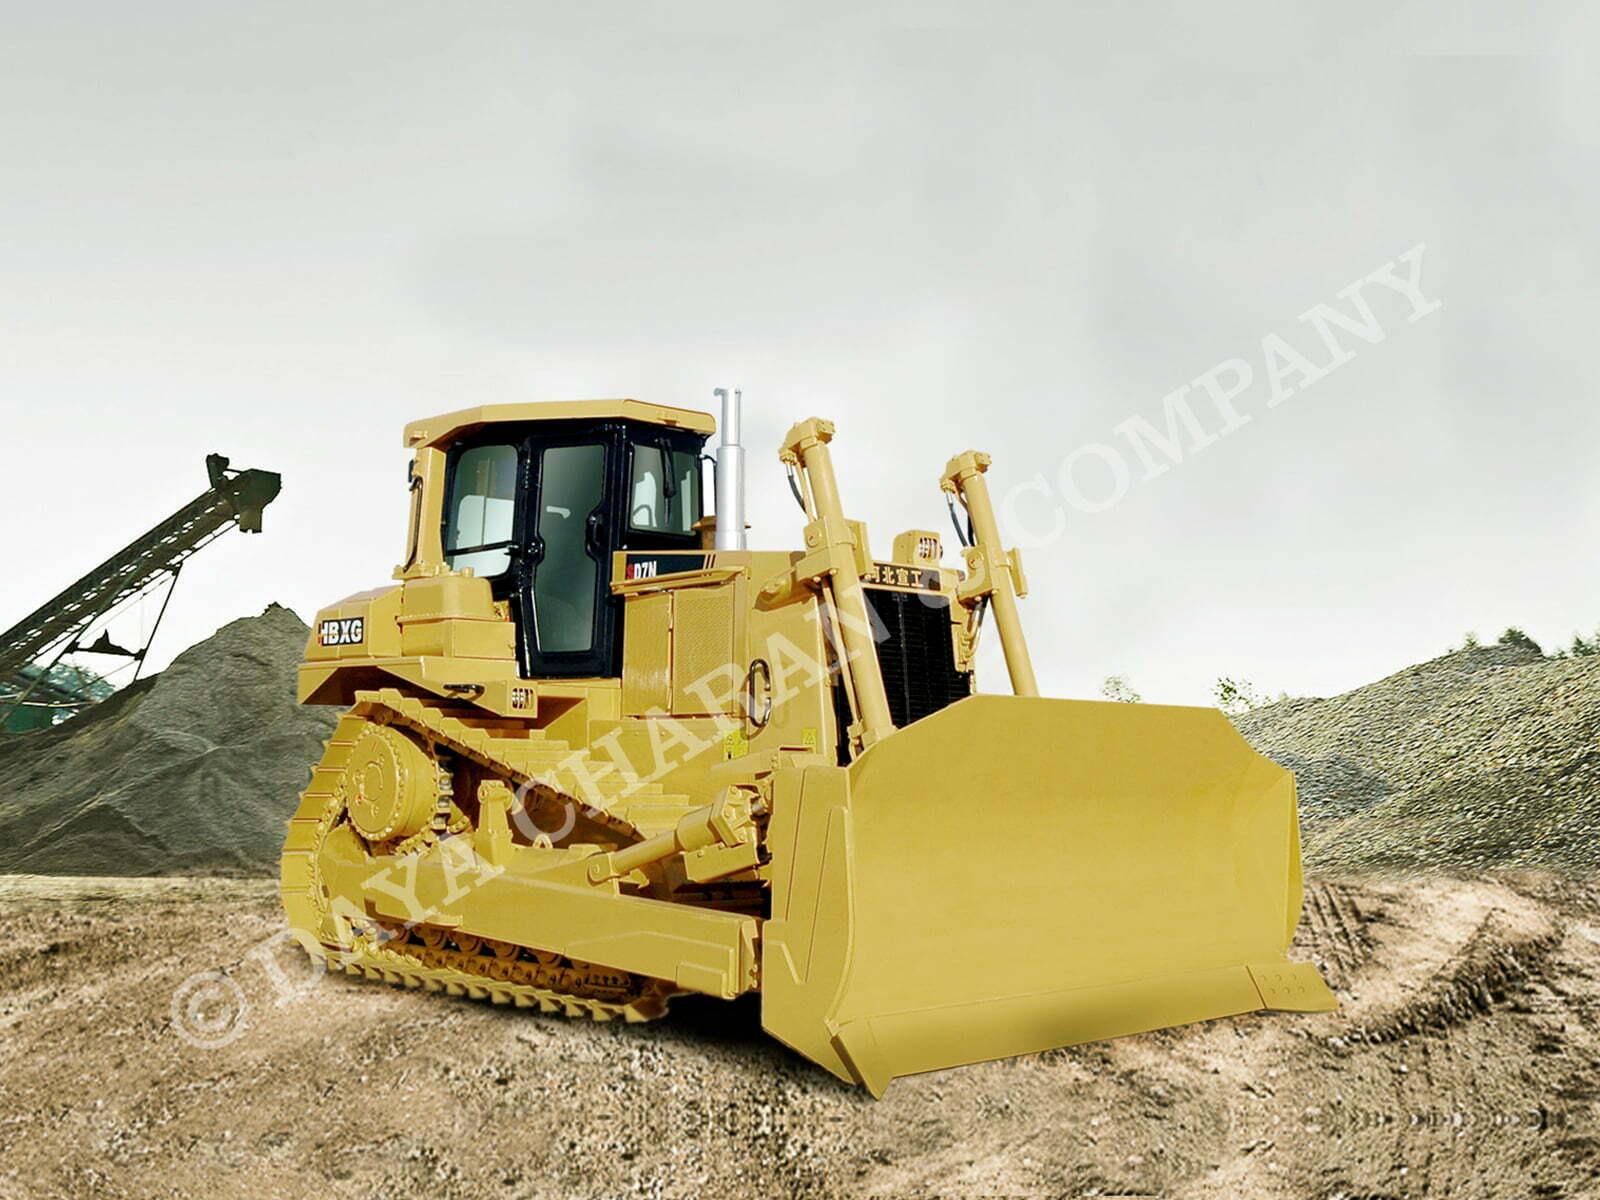 SD7N Bulldozer